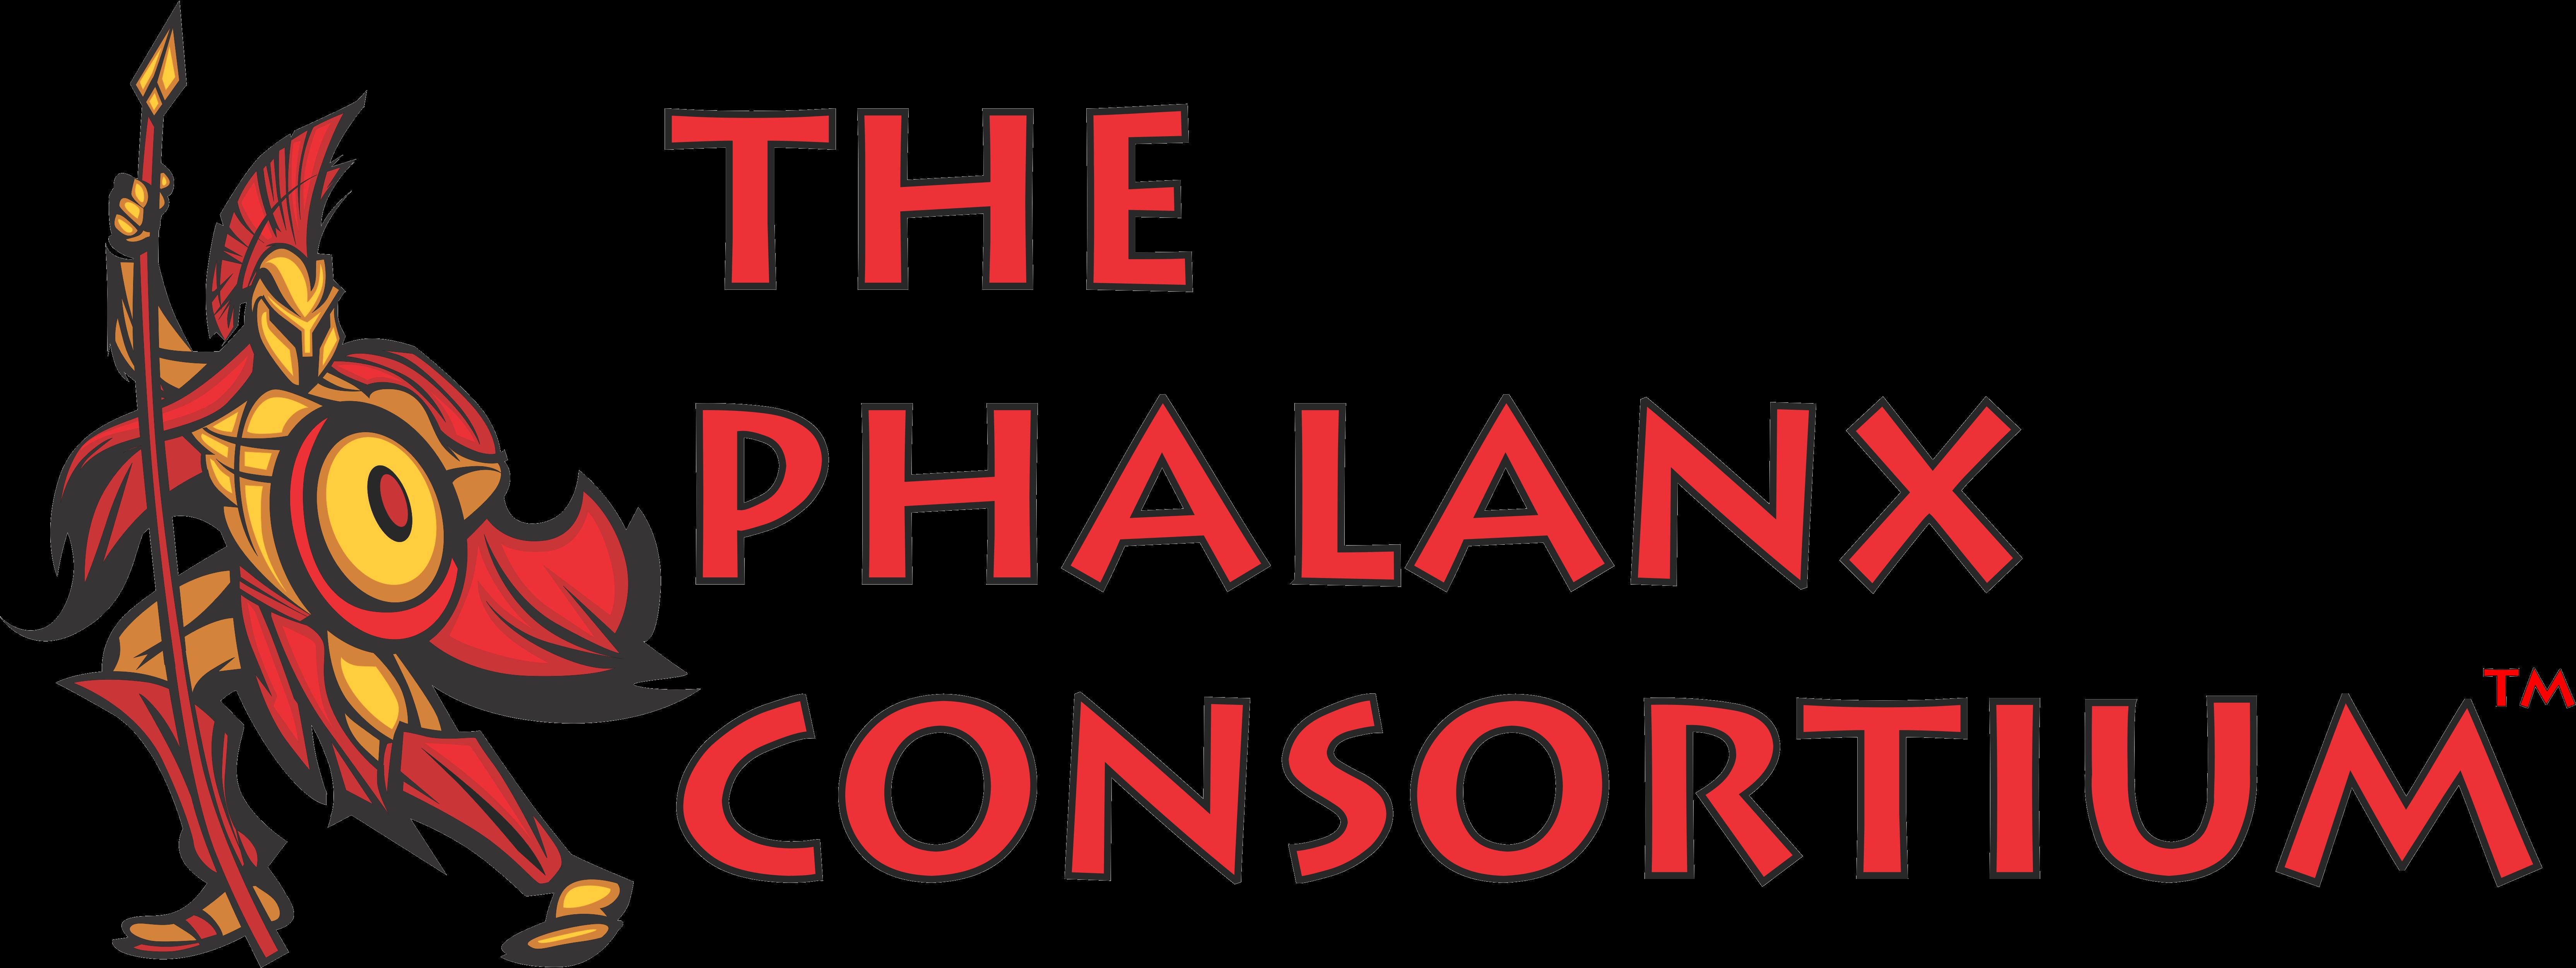 The Phalanx Consortium